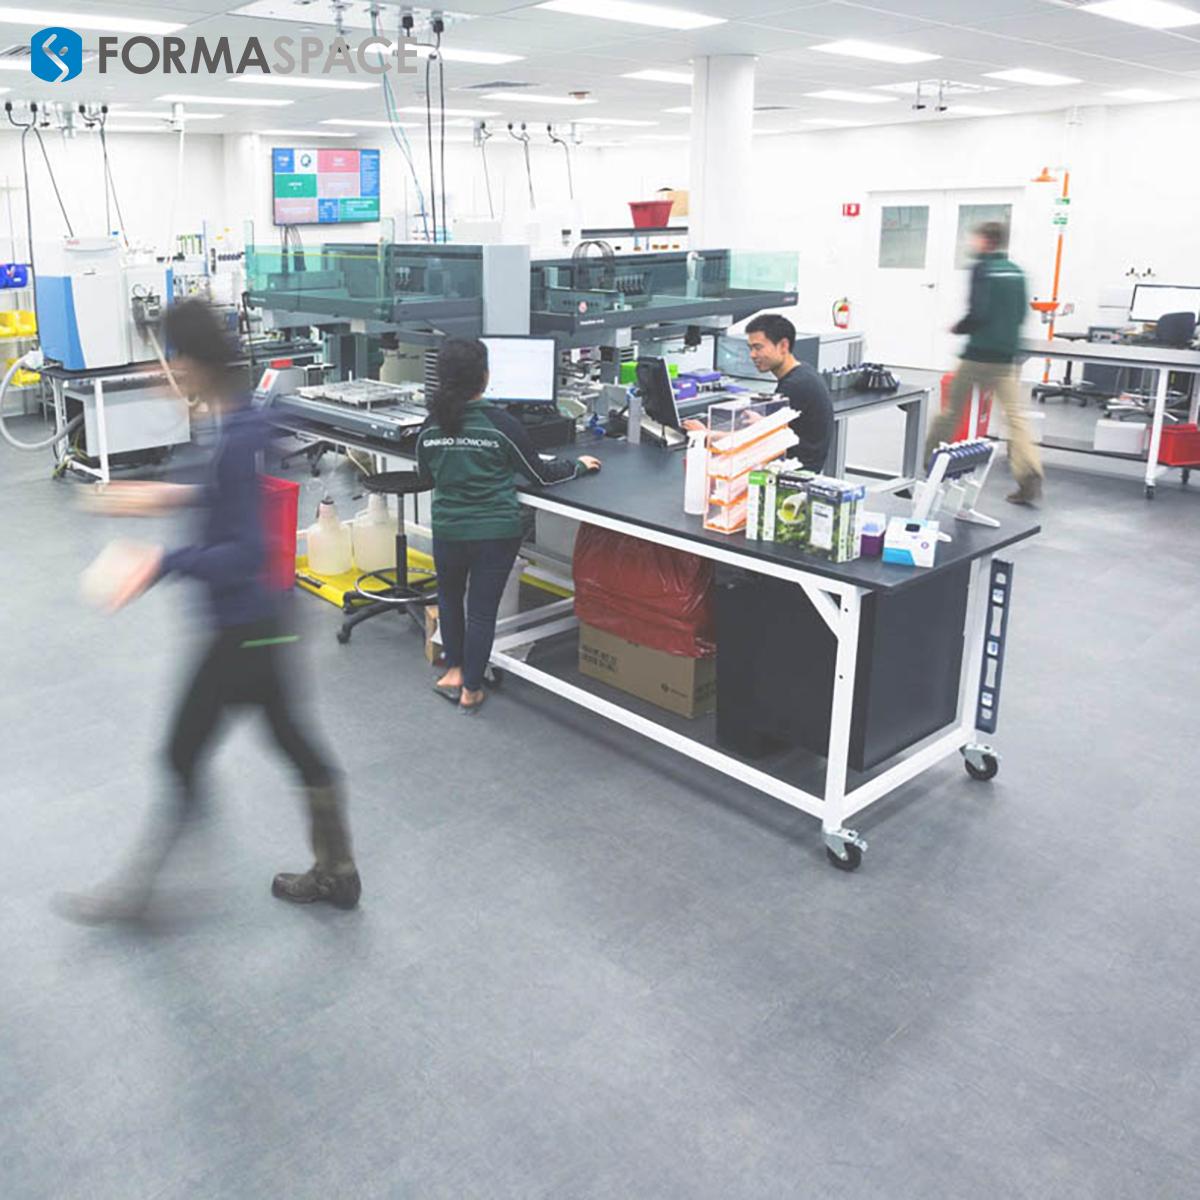 Modified Basix Workbenches in Ginkgo BioWorks Laboratory